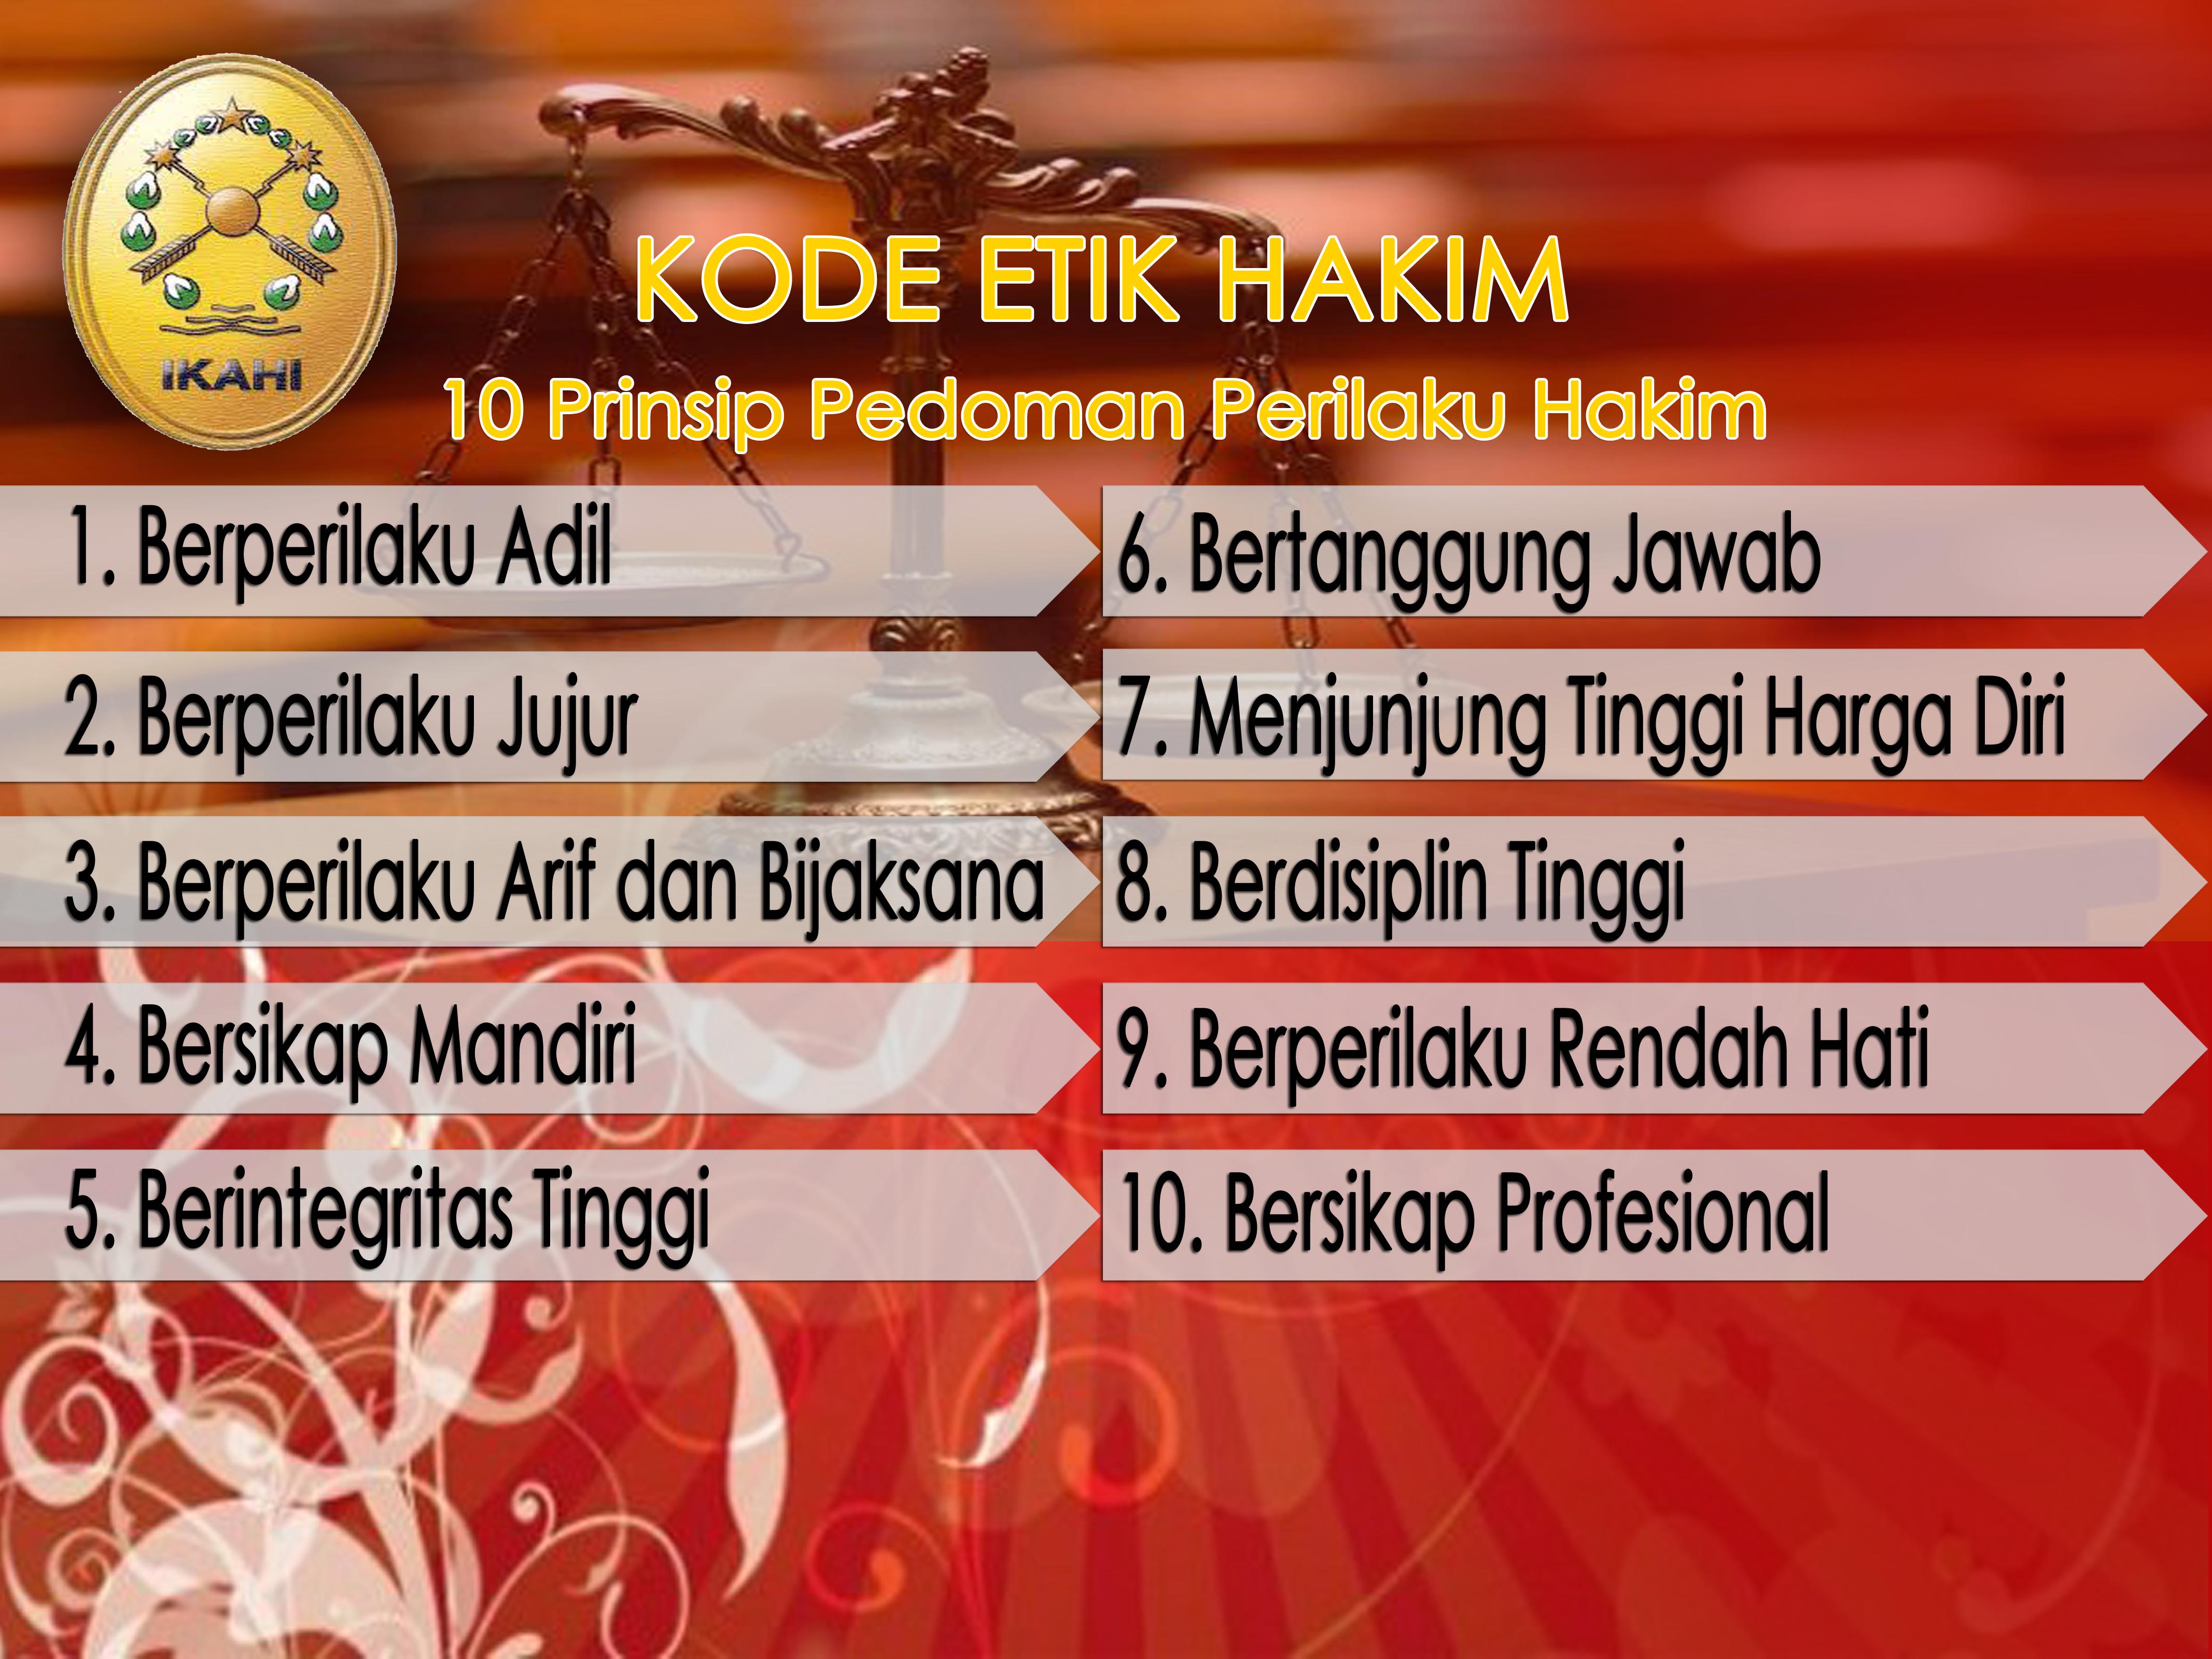 Kode Etik Hakim